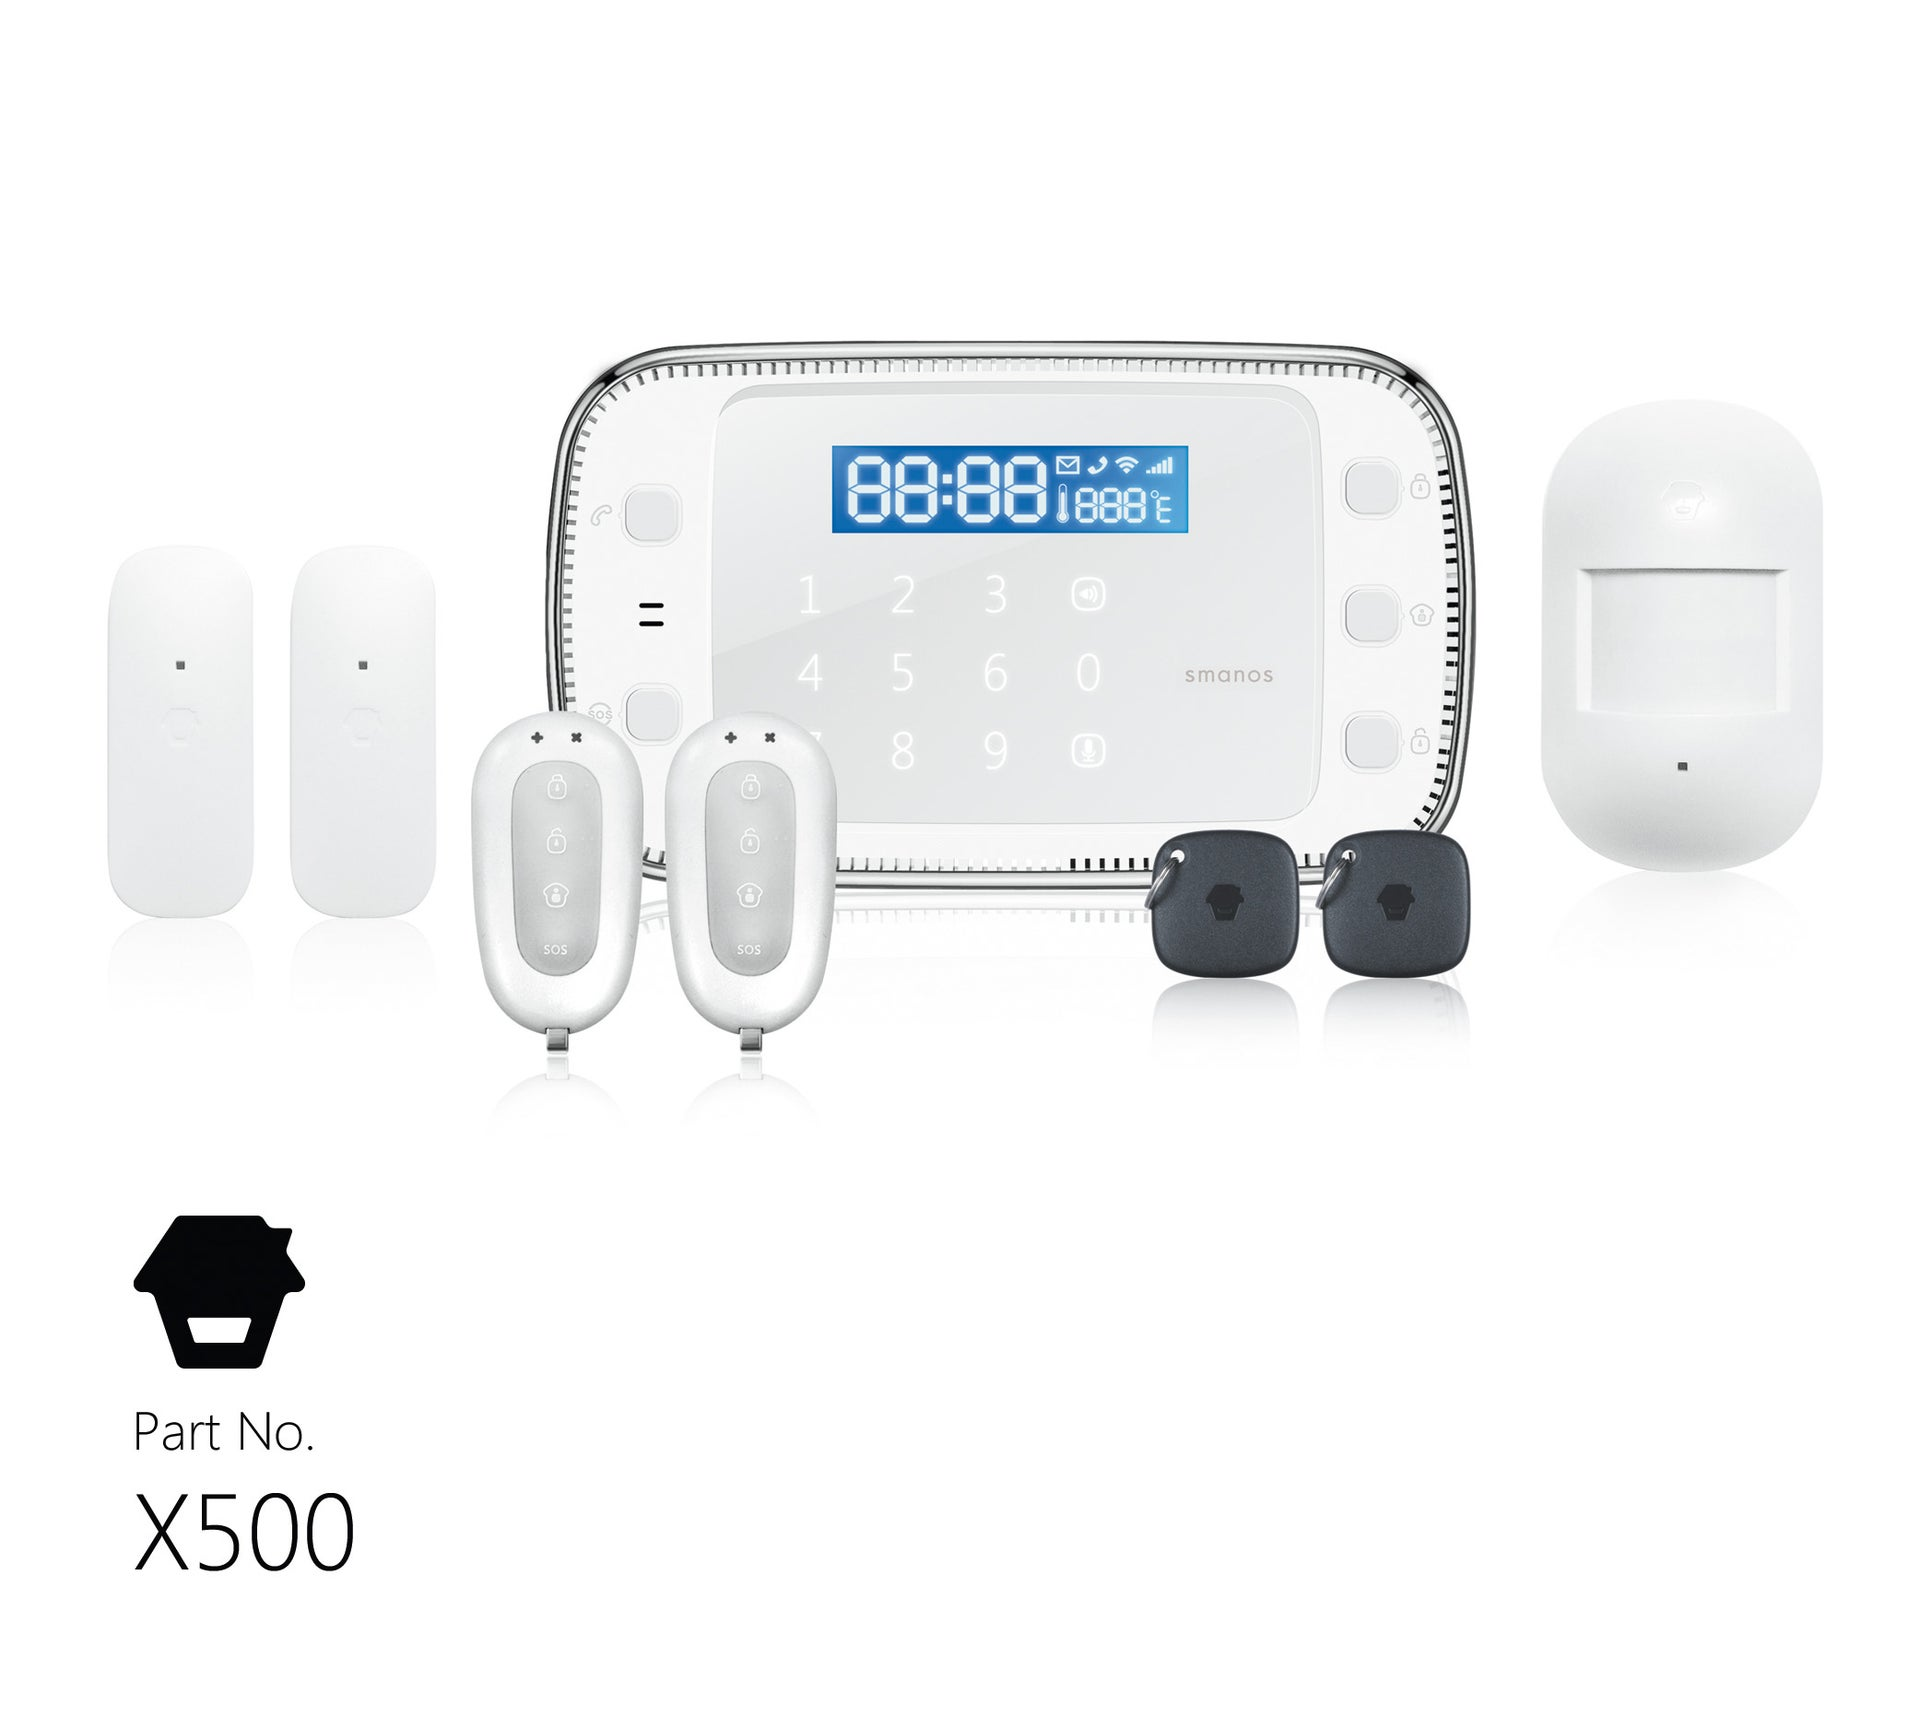 Alarme Maison Sans Fil Connectee Smanos X500 Leroy Merlin